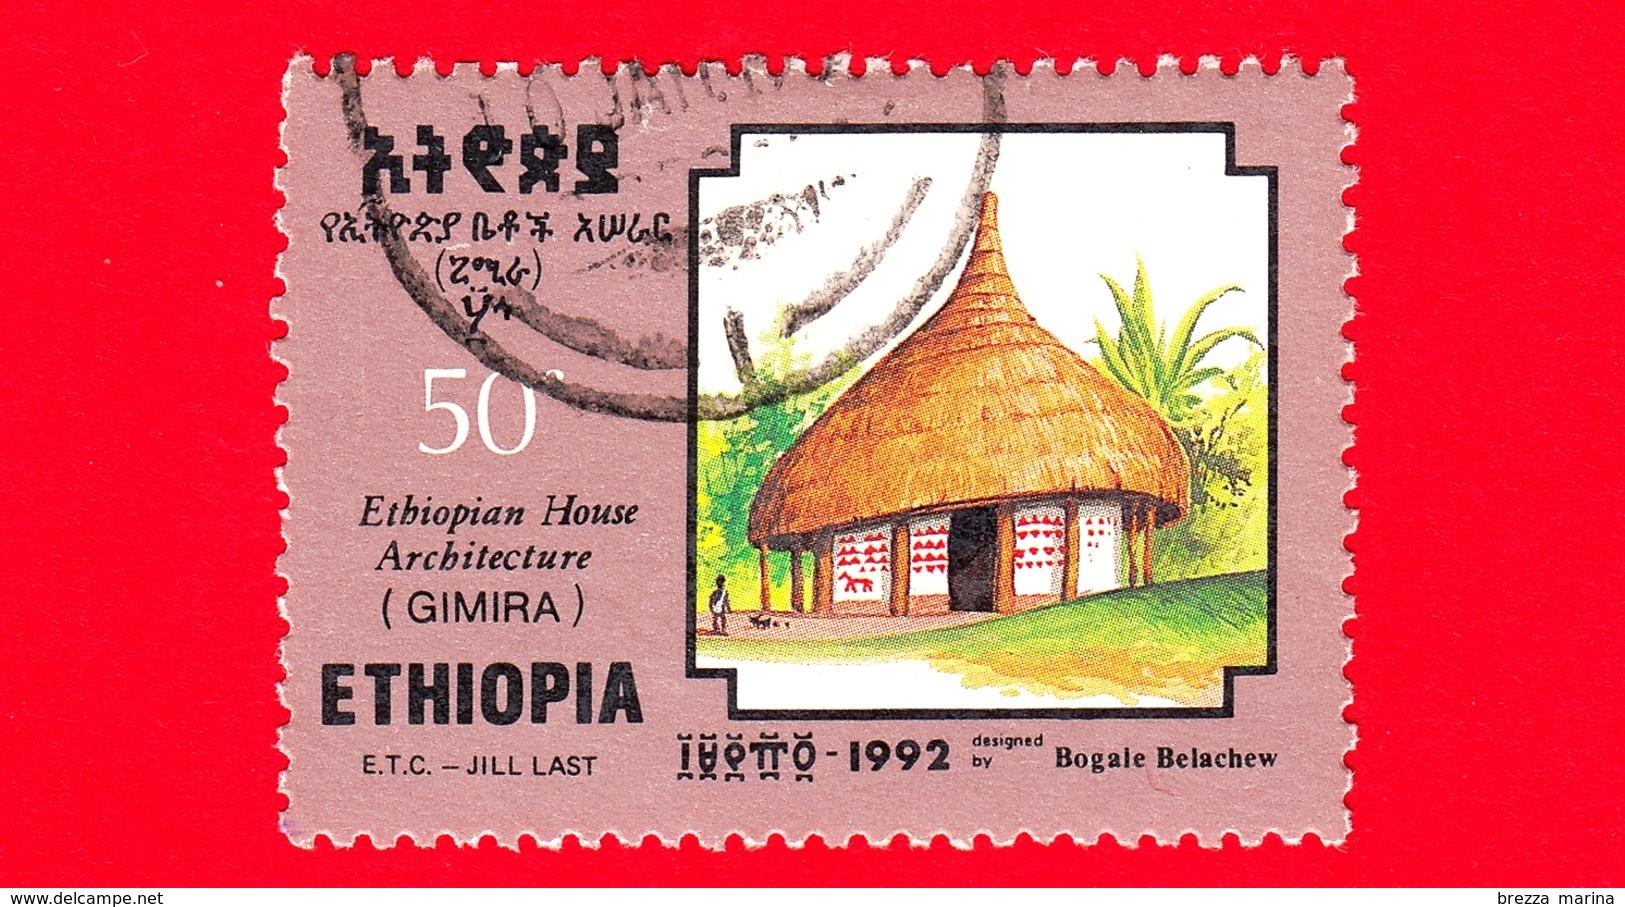 ETIOPIA - Usato - 1992 - Case Tradizionali - Architettura - Ethopian House Architecture - Gimira - 50 - Etiopia